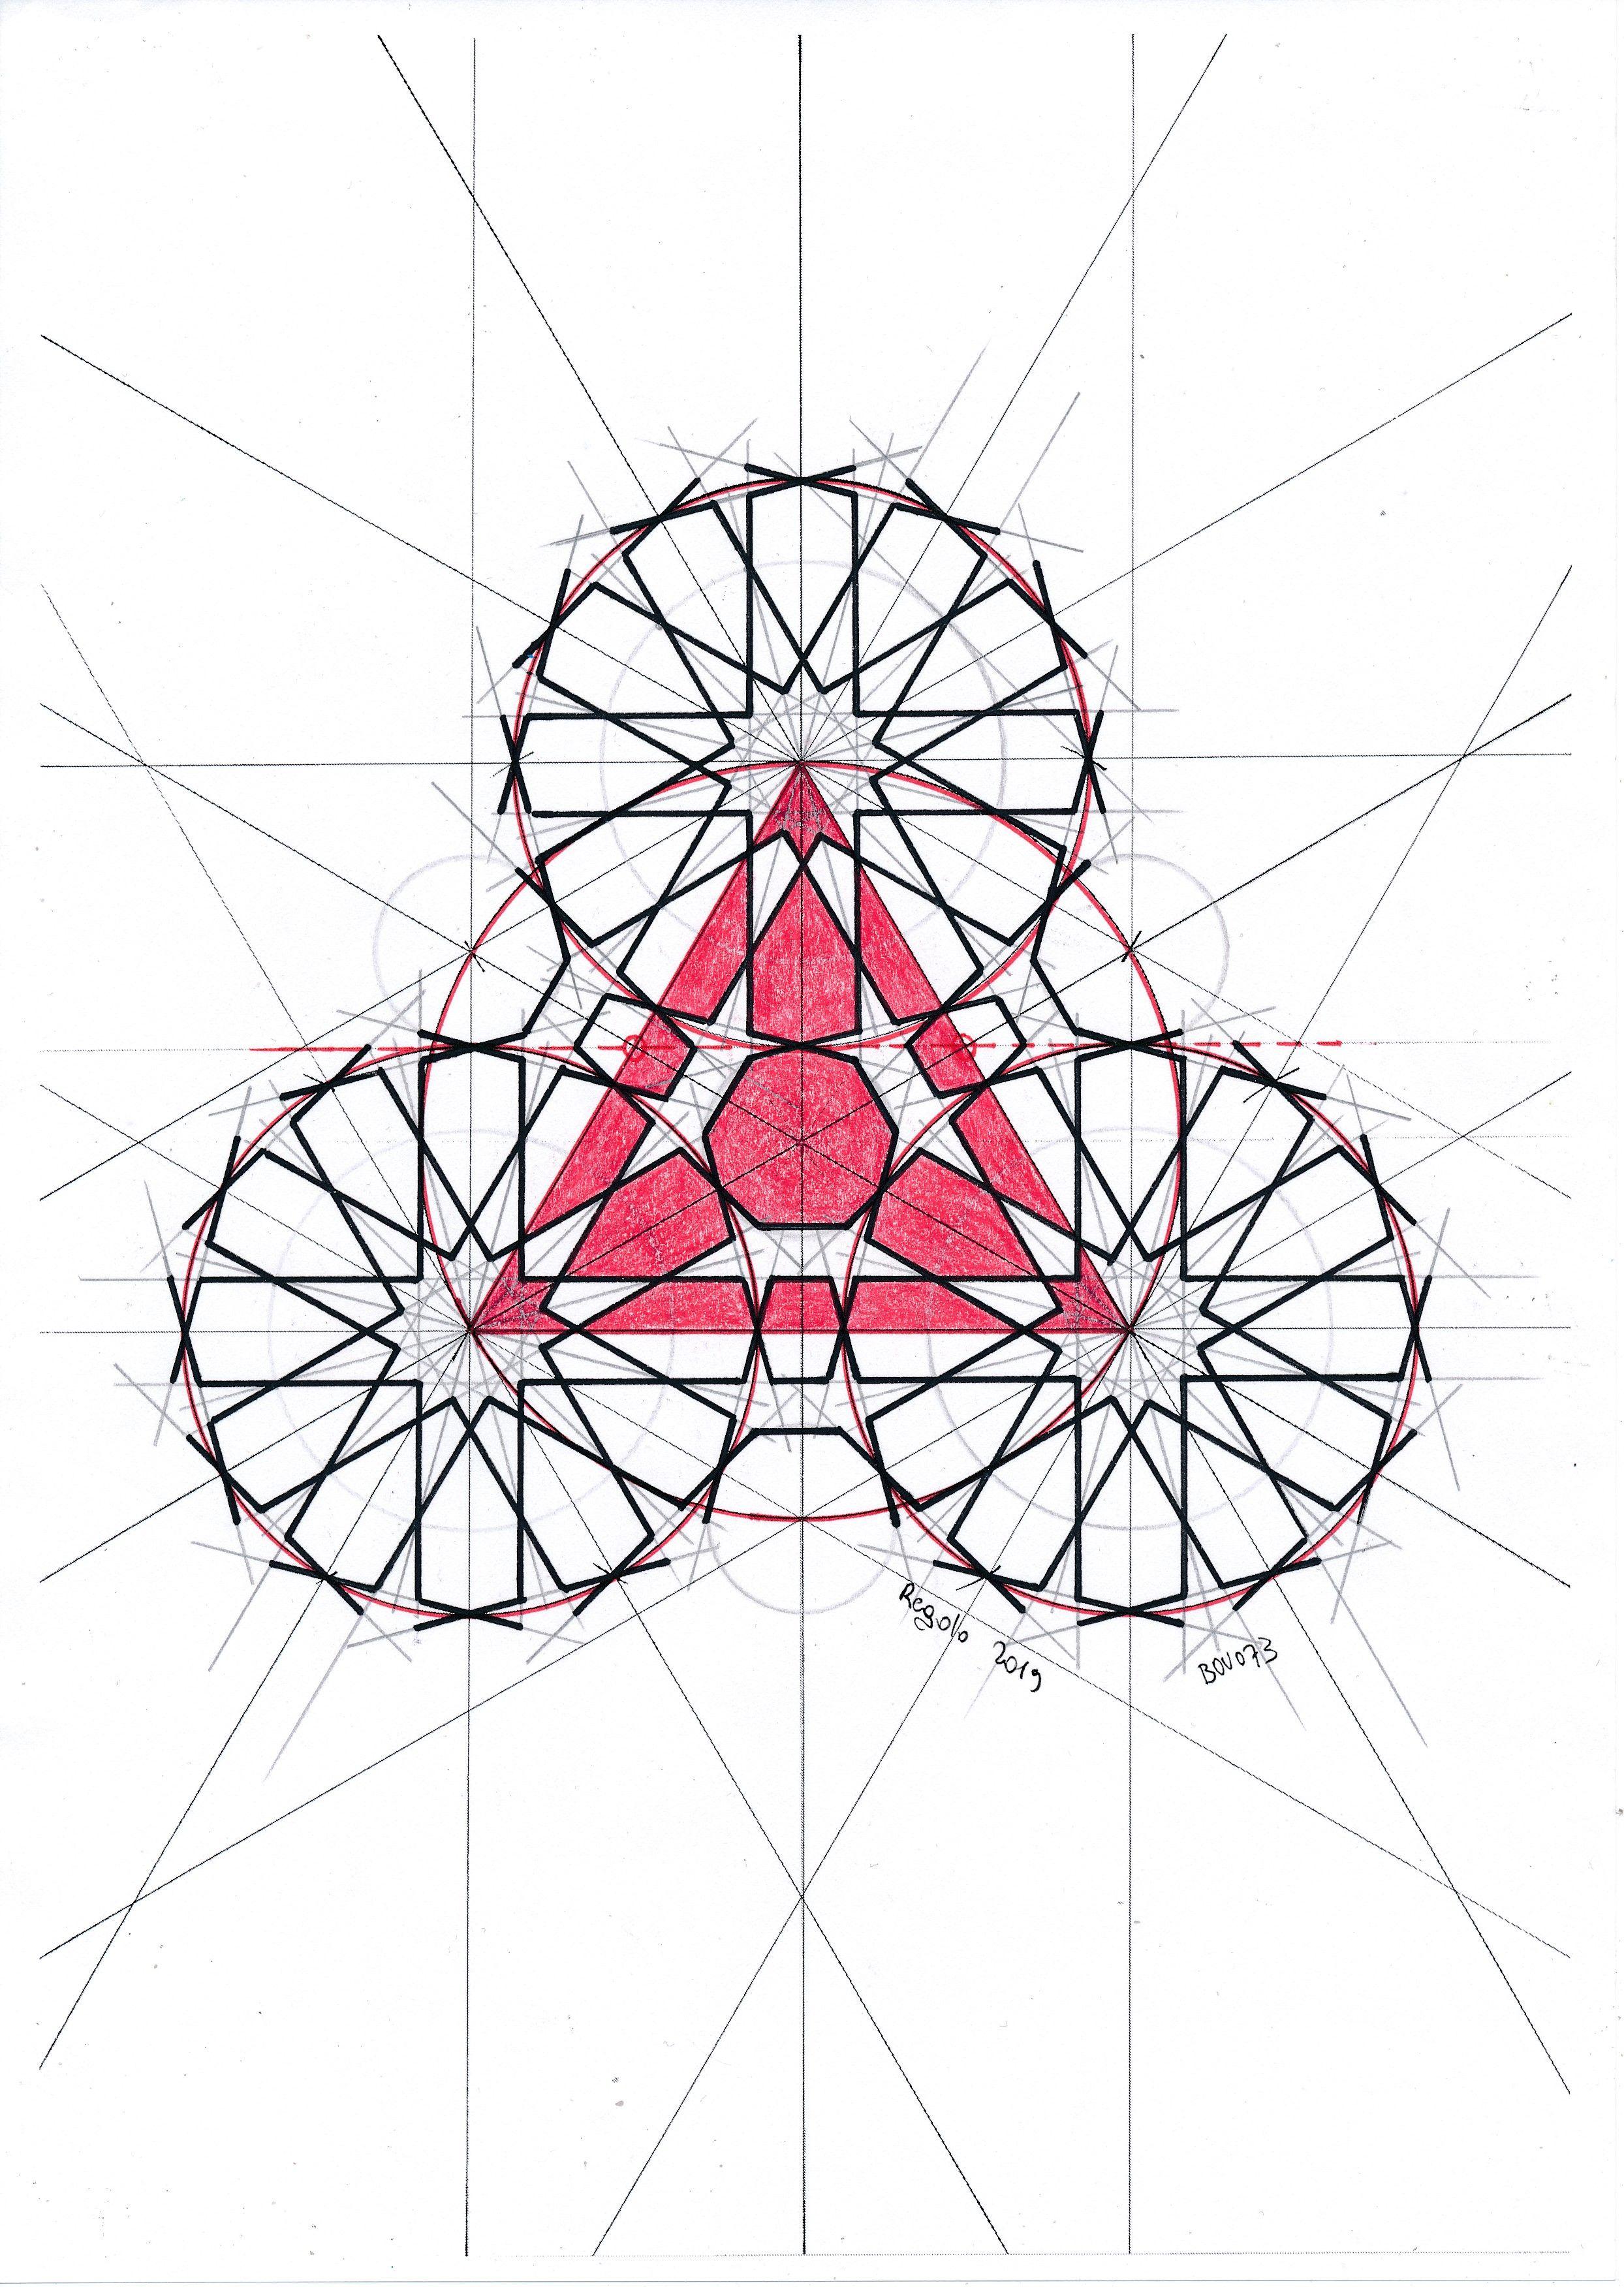 Bou073 Islamicart Islamicdesign Islamicgeometry